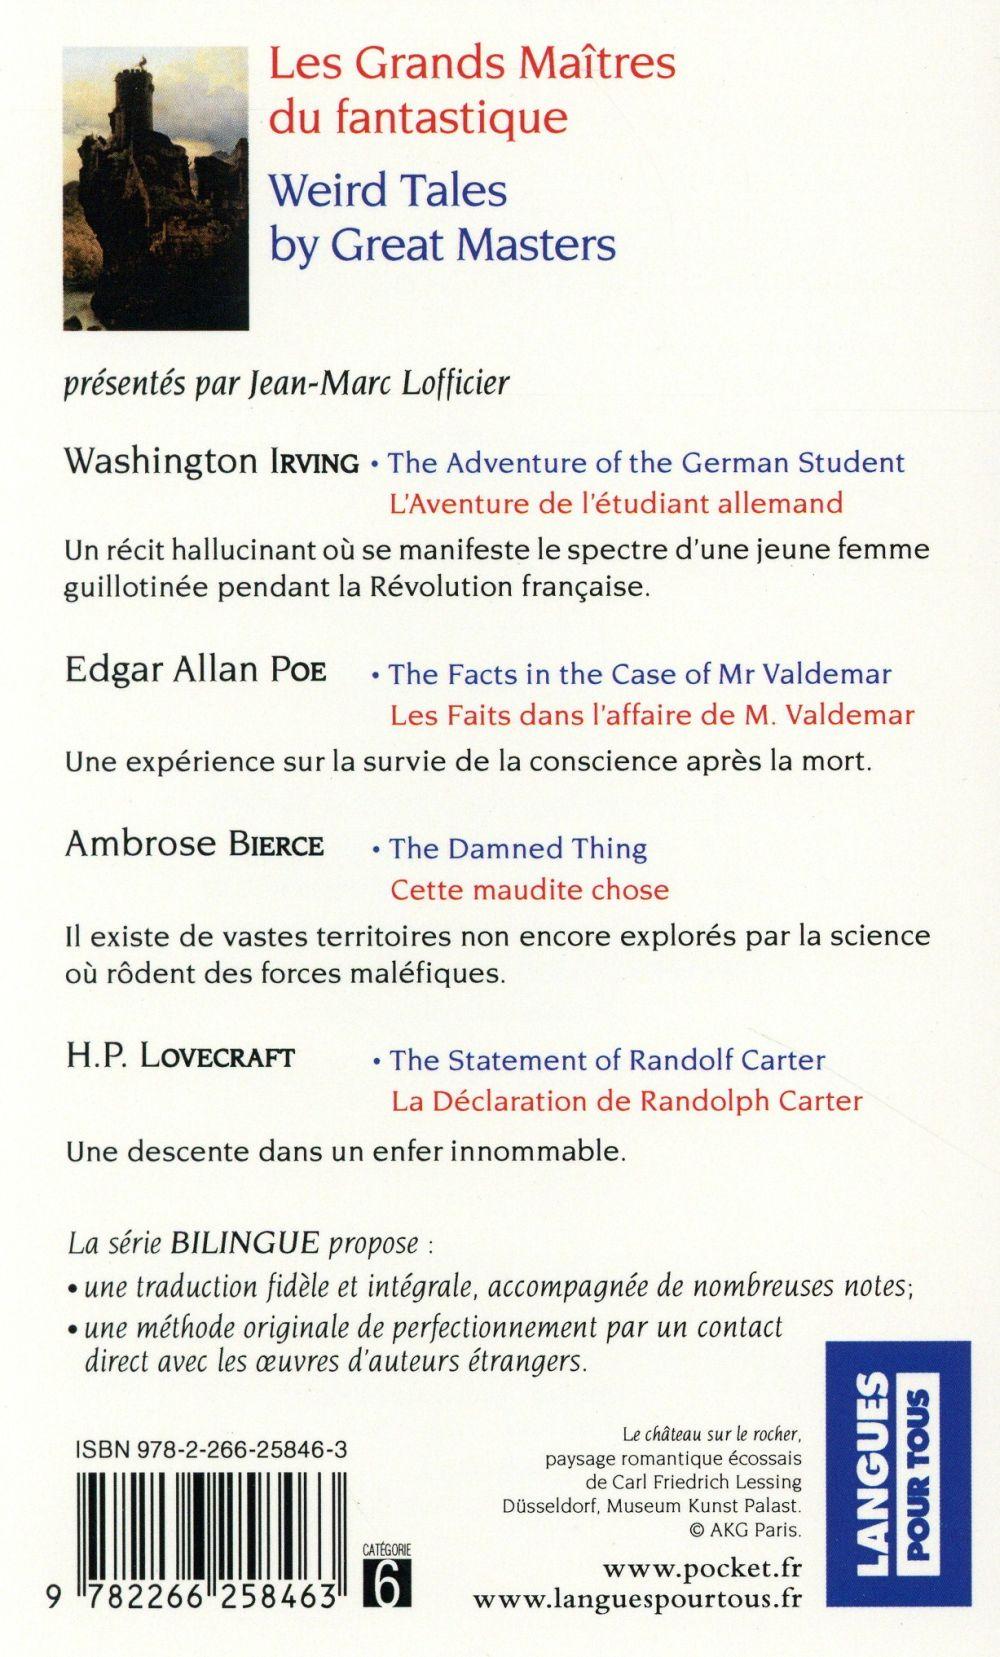 les grands maîtres du fantastique ; weird tales by great masters